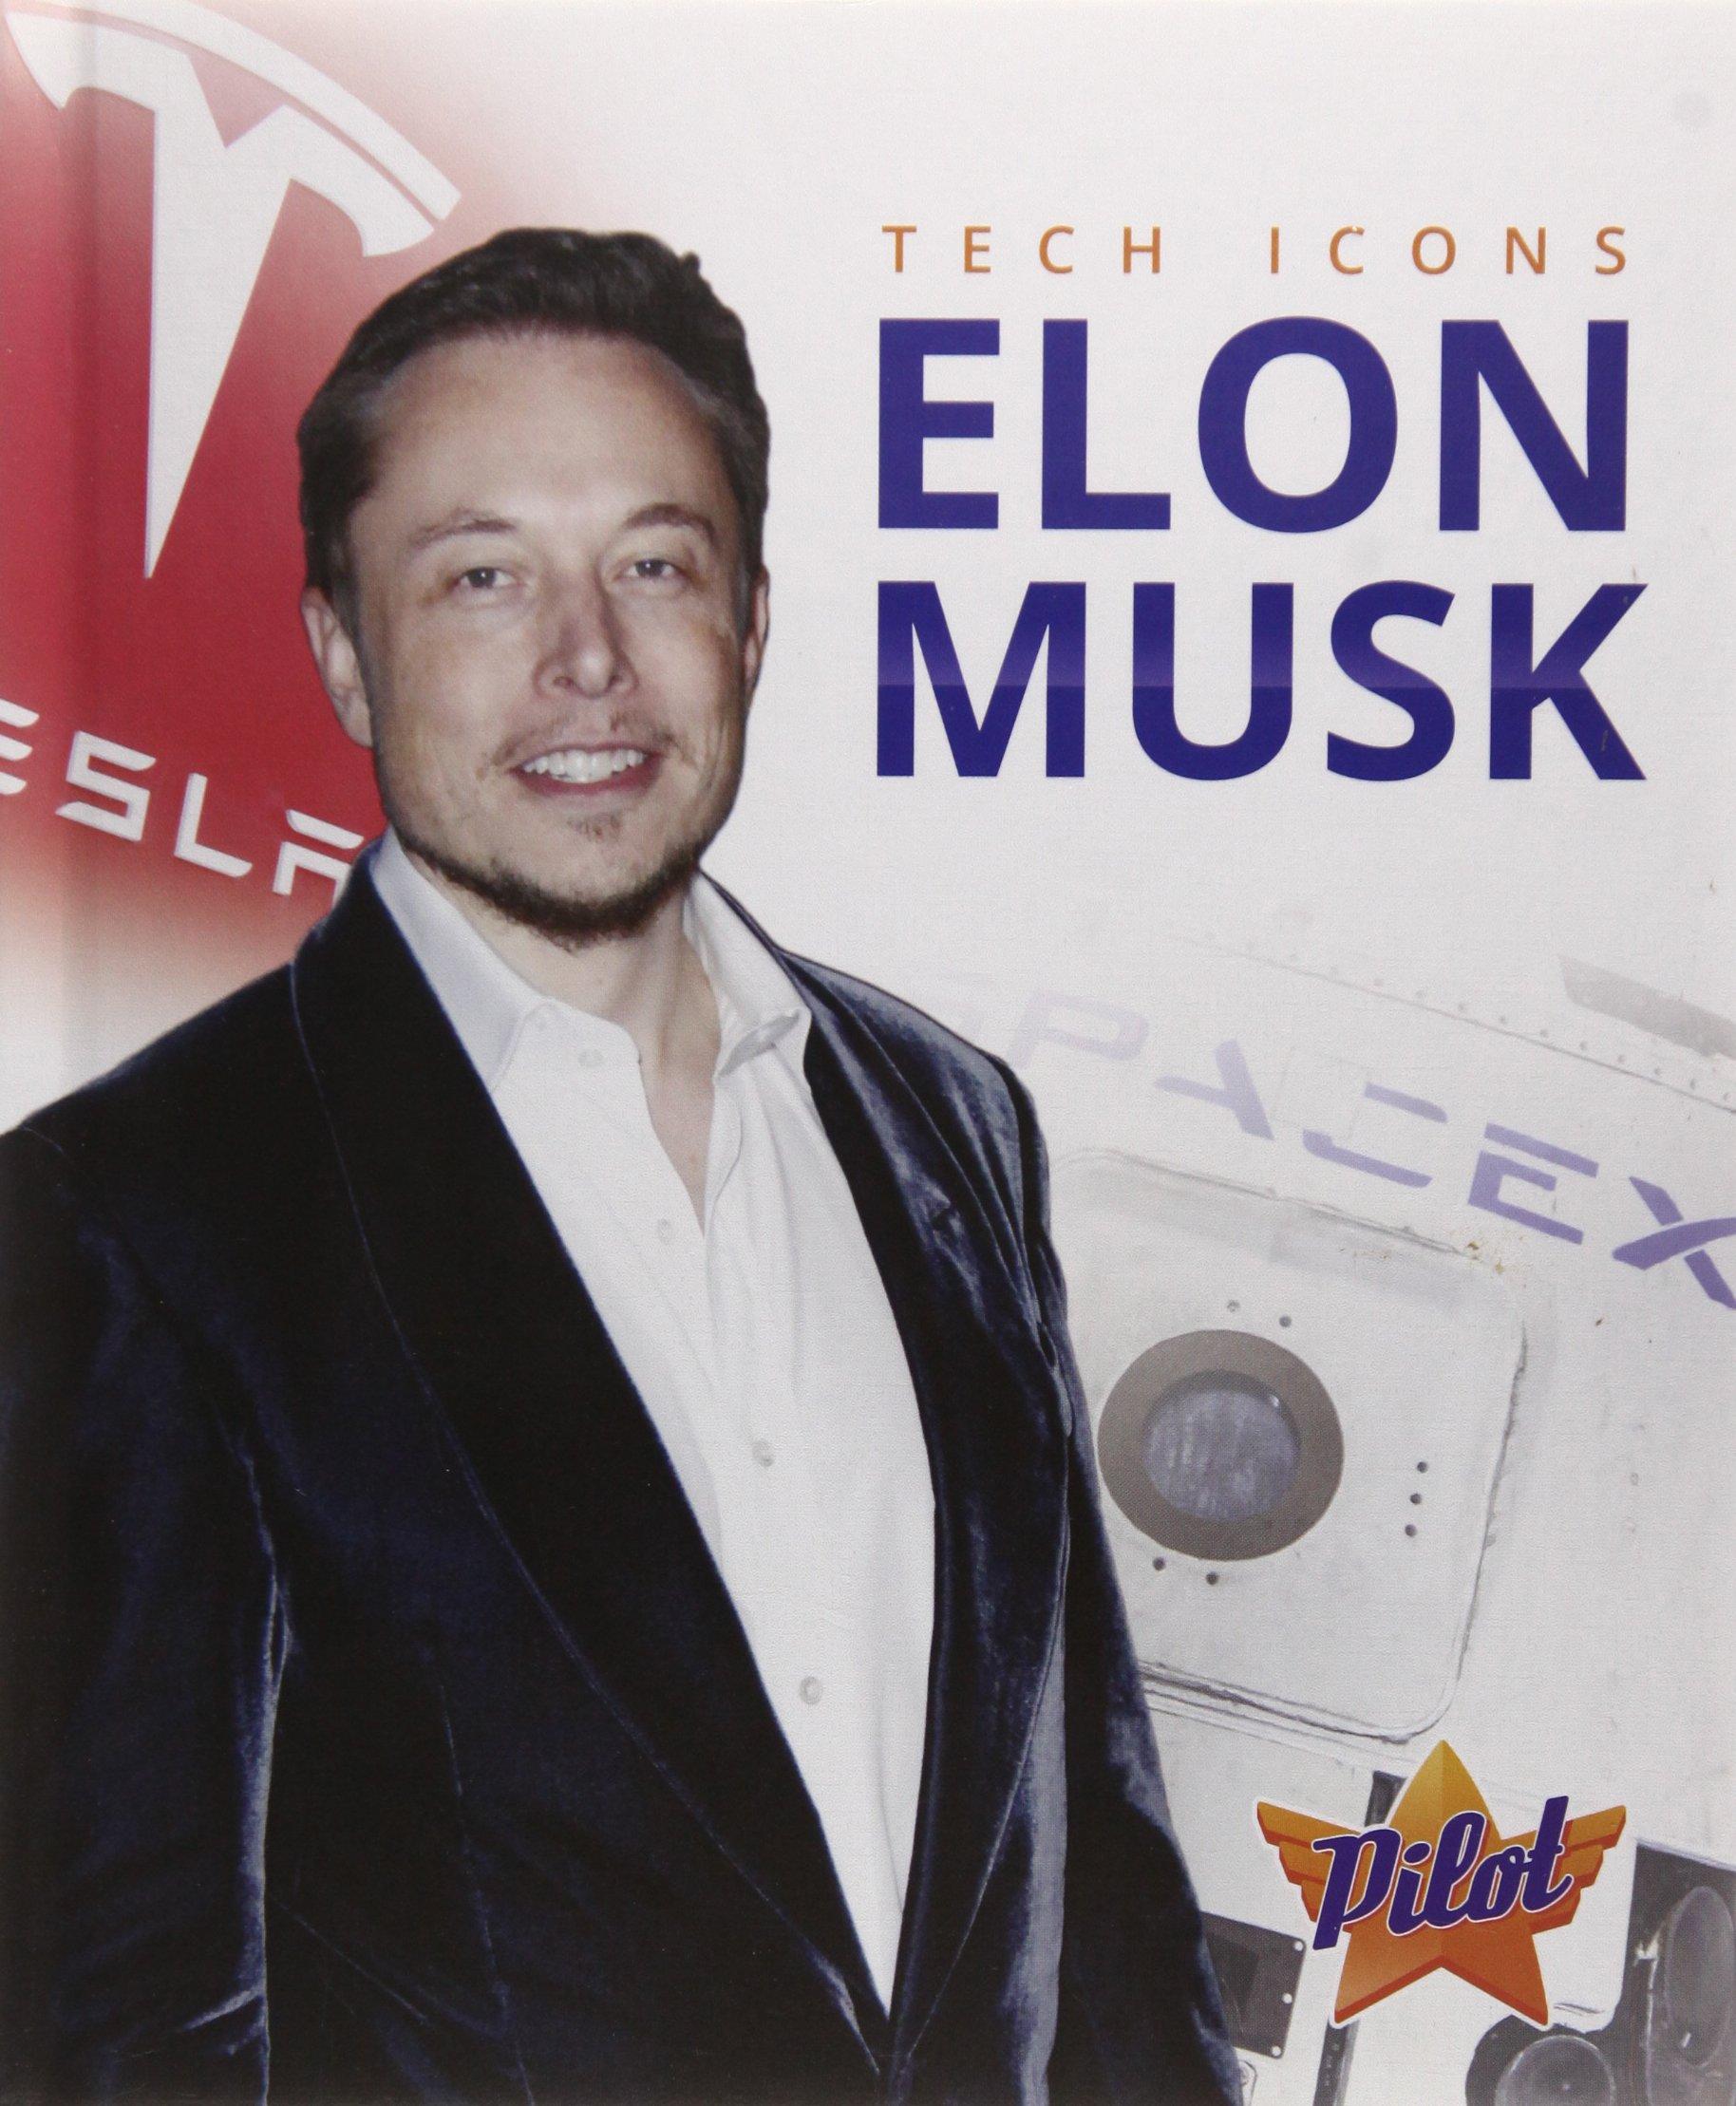 Elon Musk (Tech Icons) PDF